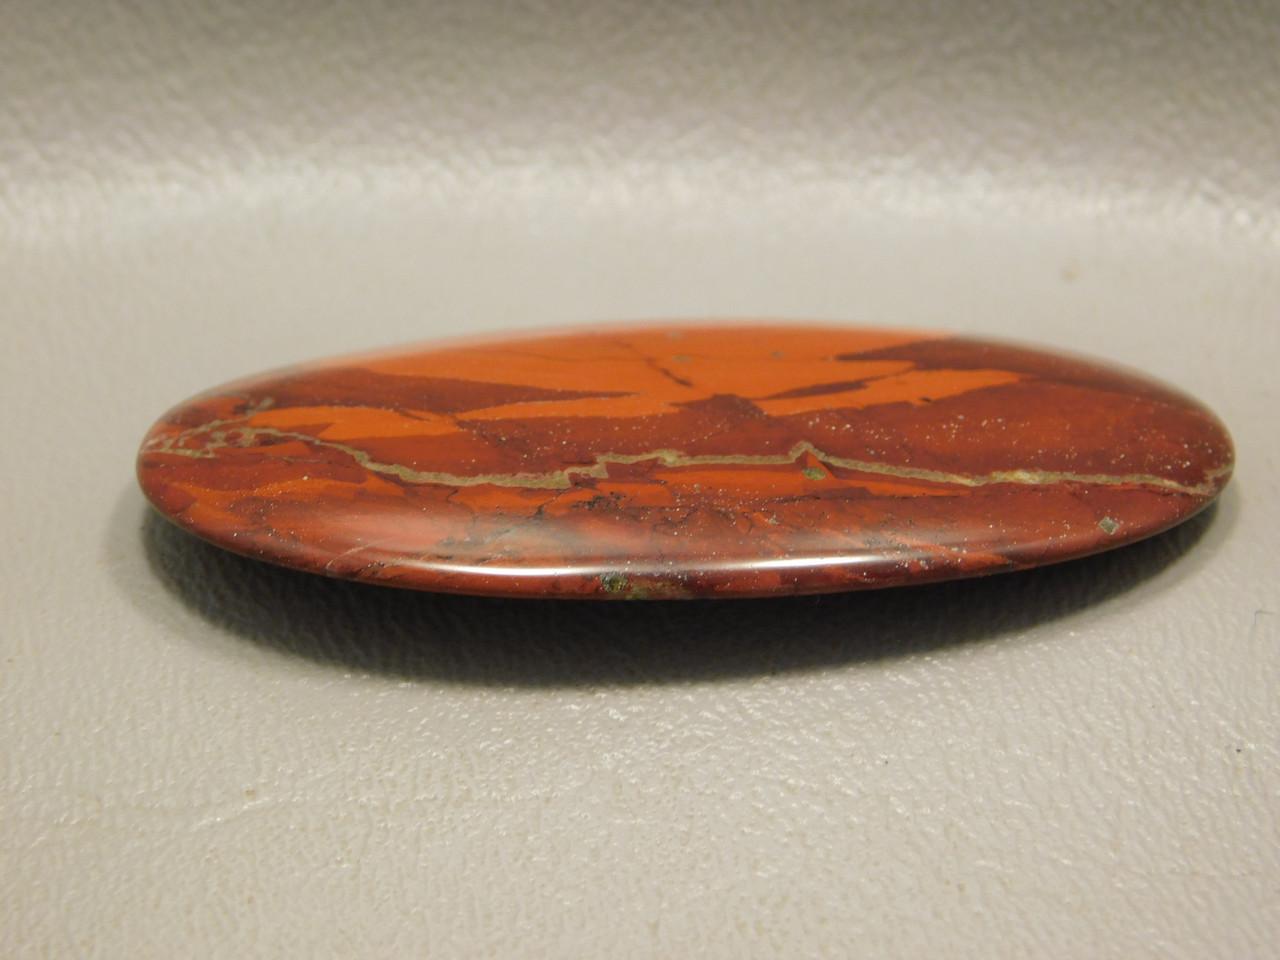 Red Jasper Cabochon Semi Precious Gemstone for Jewelry Making #20